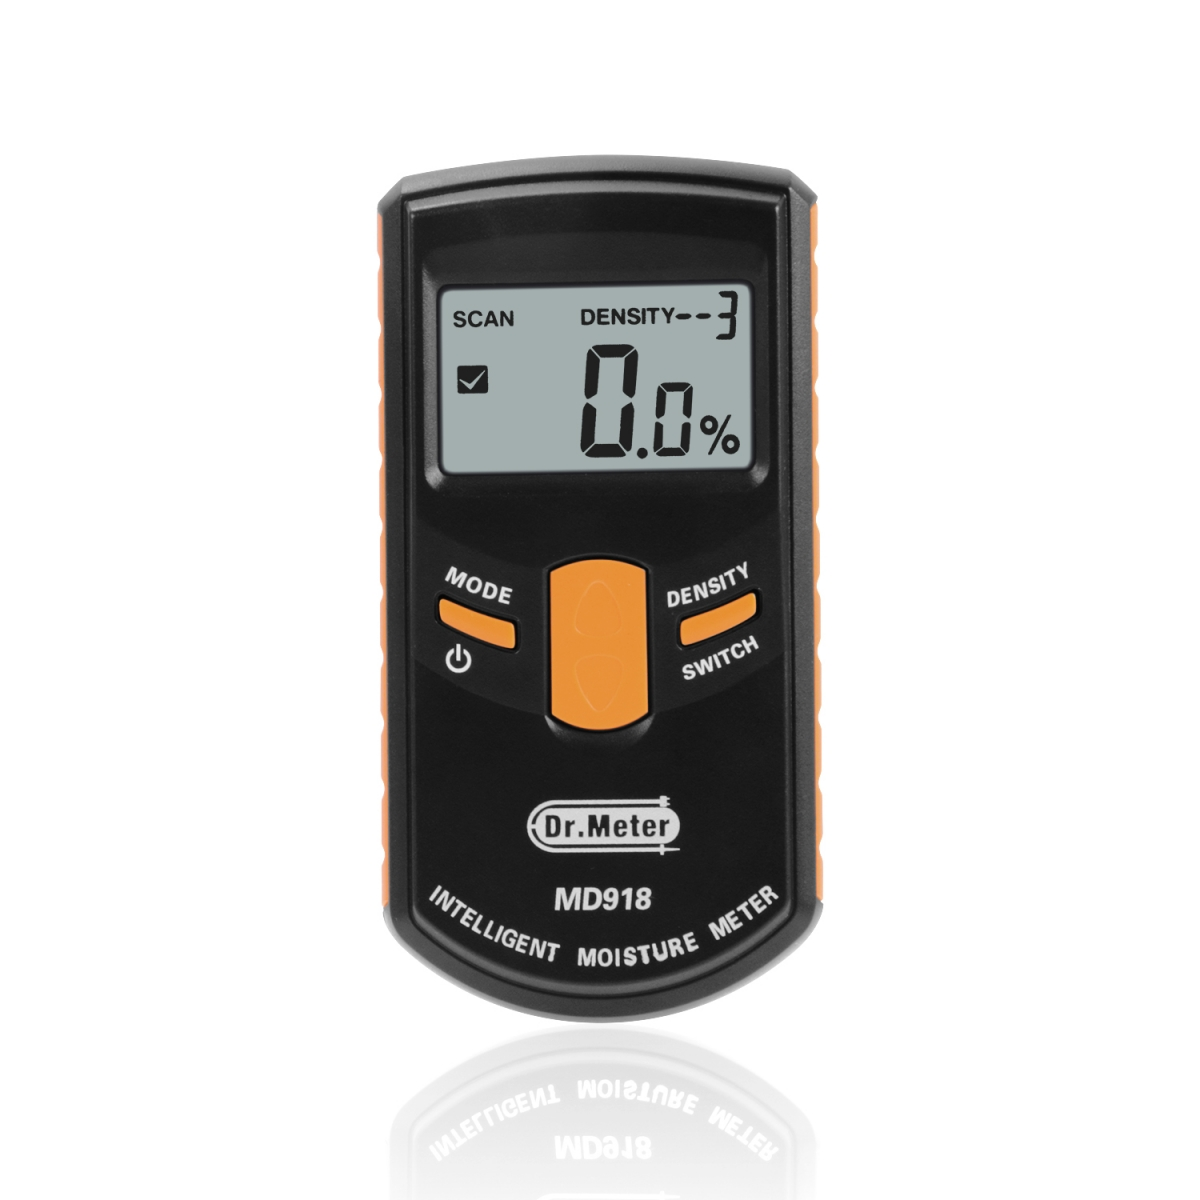 Dr.Meter Inductive Pinless Tools Intelligent Moisture Meter Digital Moisture Meter For Wood